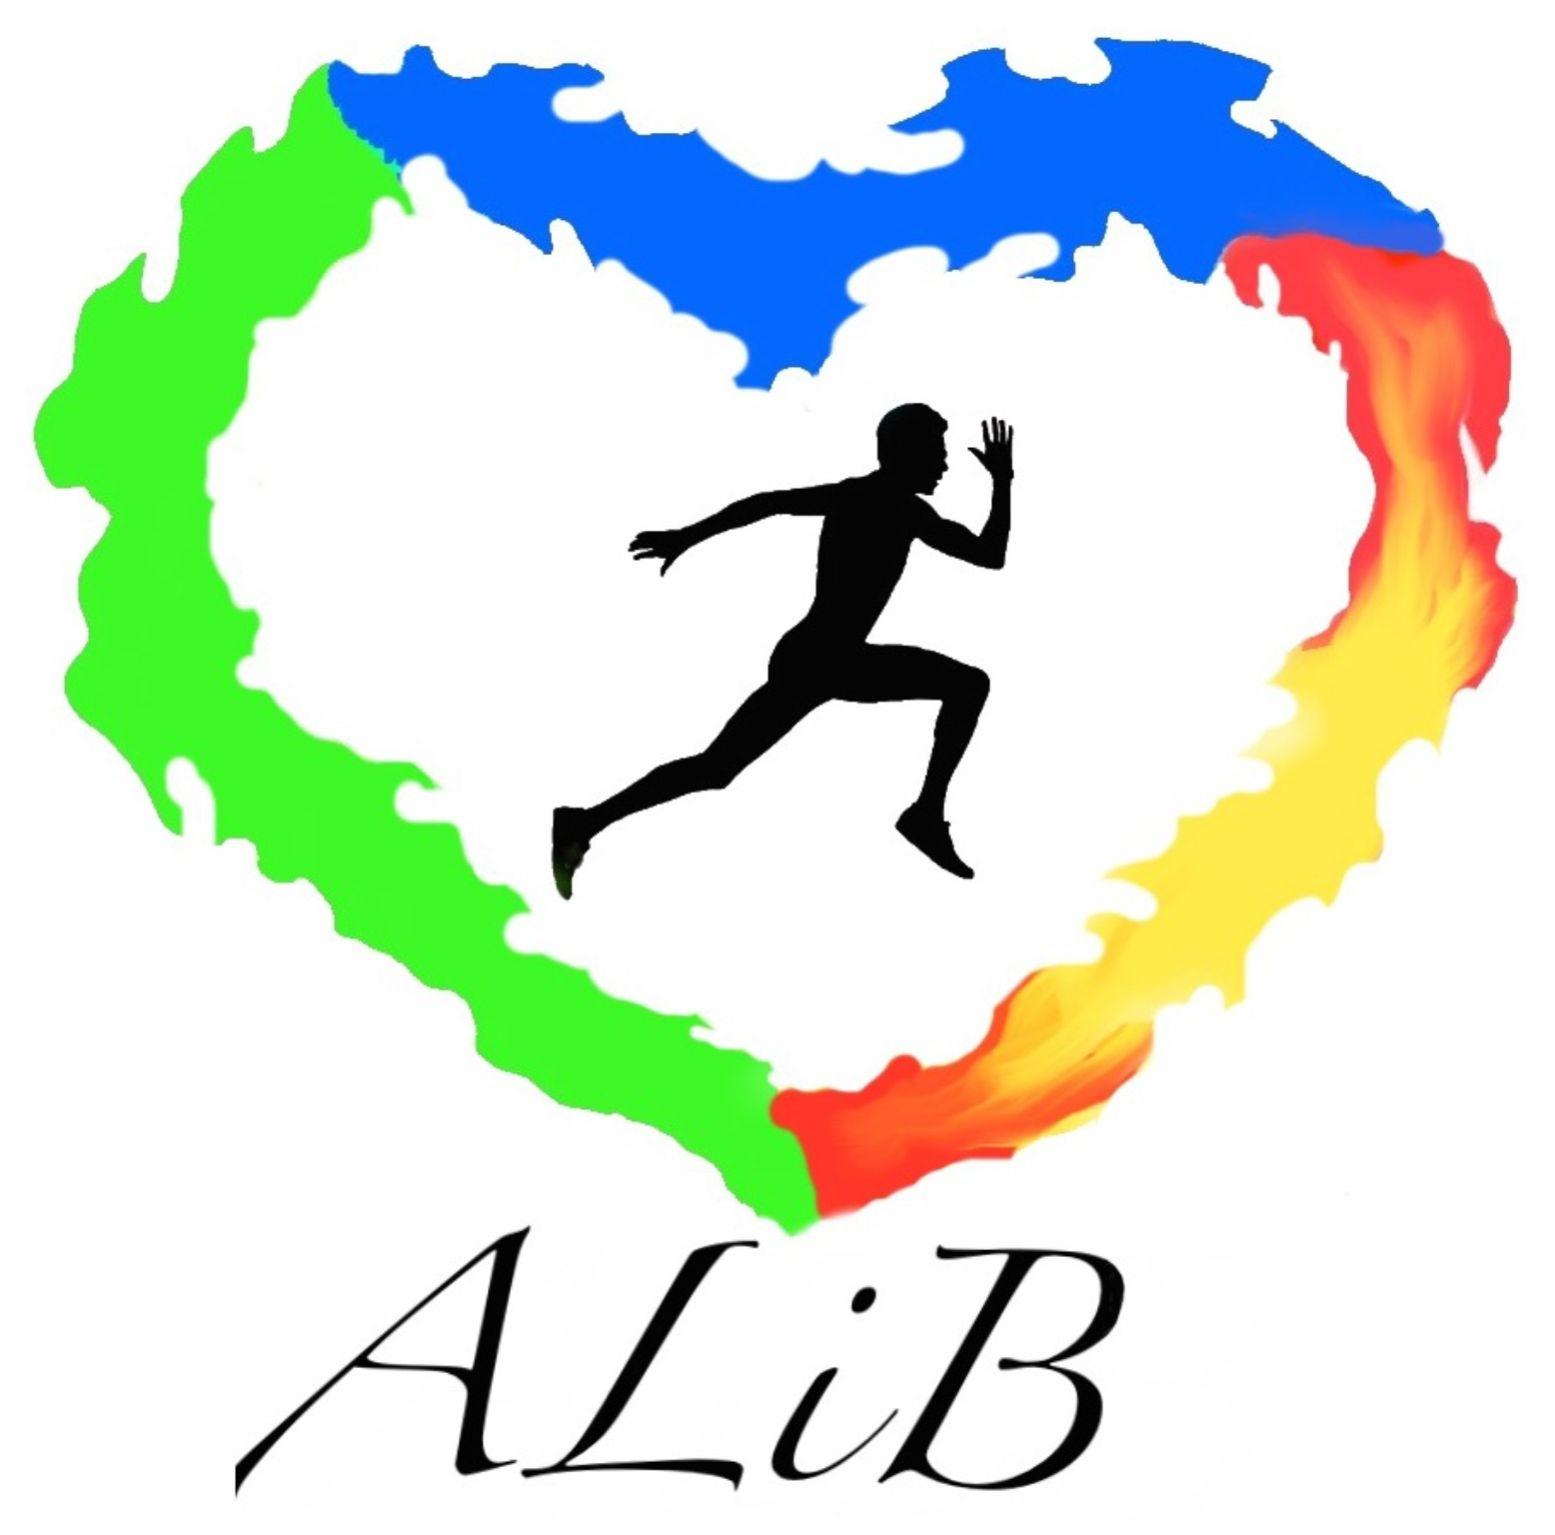 Wort-/Bildmarke: ALiB